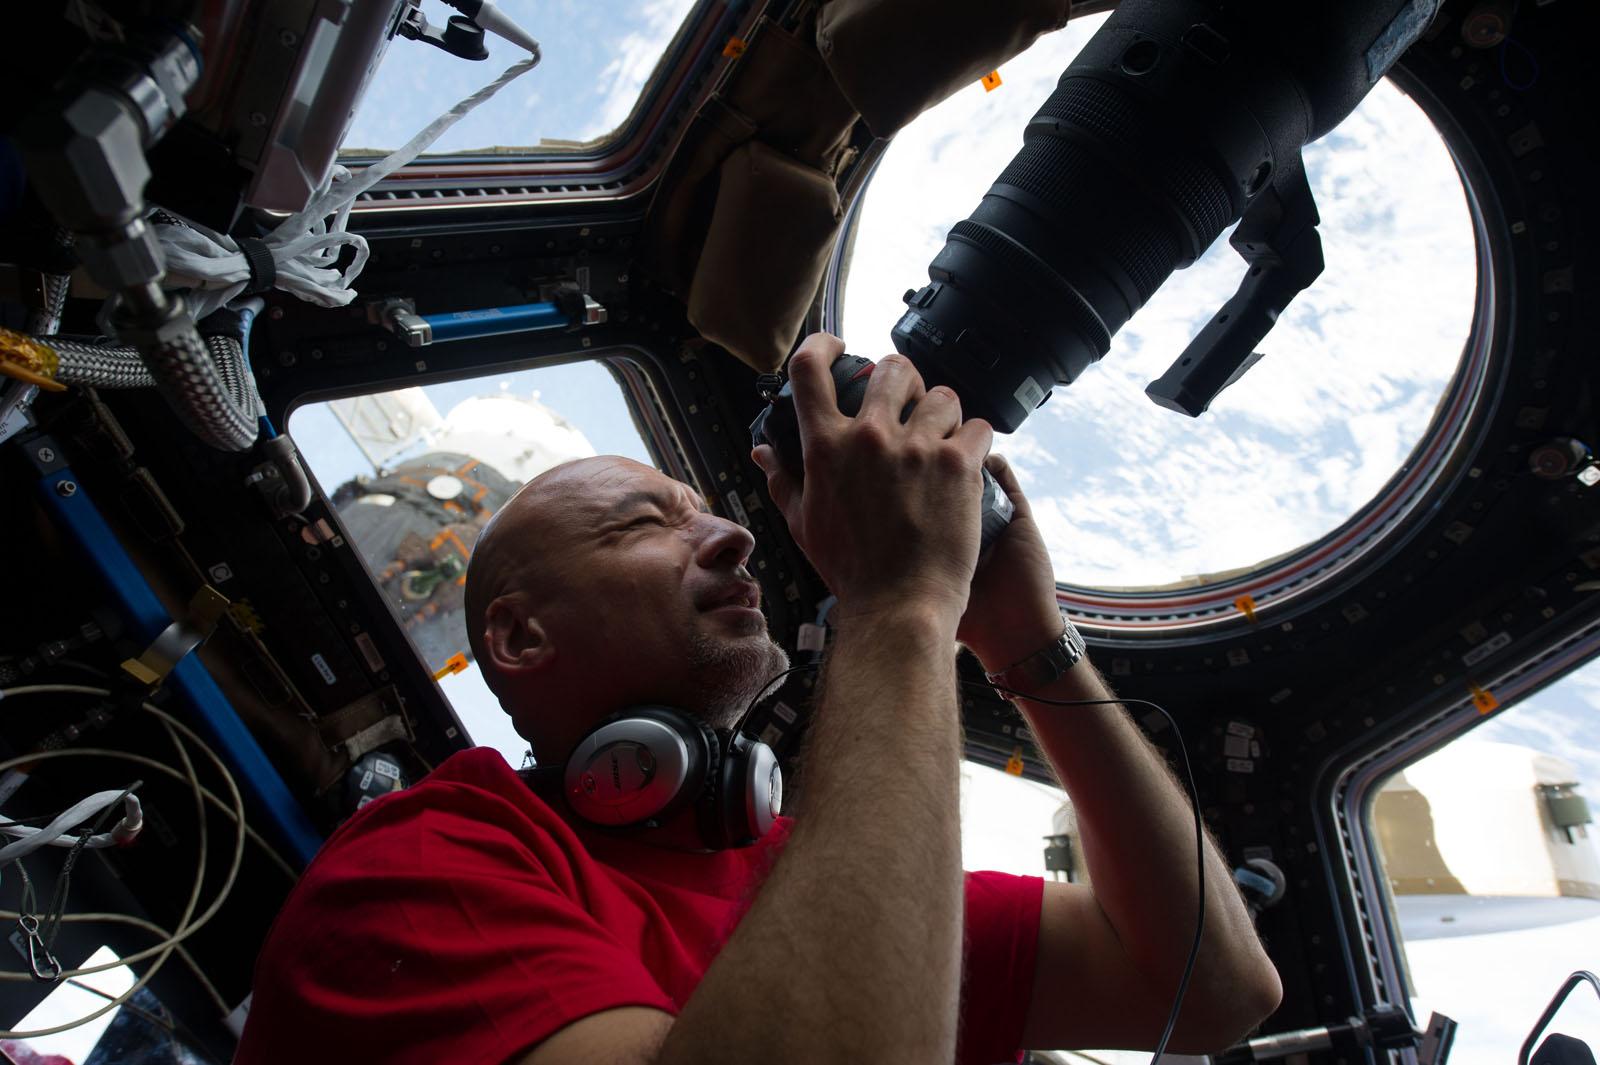 Italian Astronaut Luca Parmitano: Shutterbug